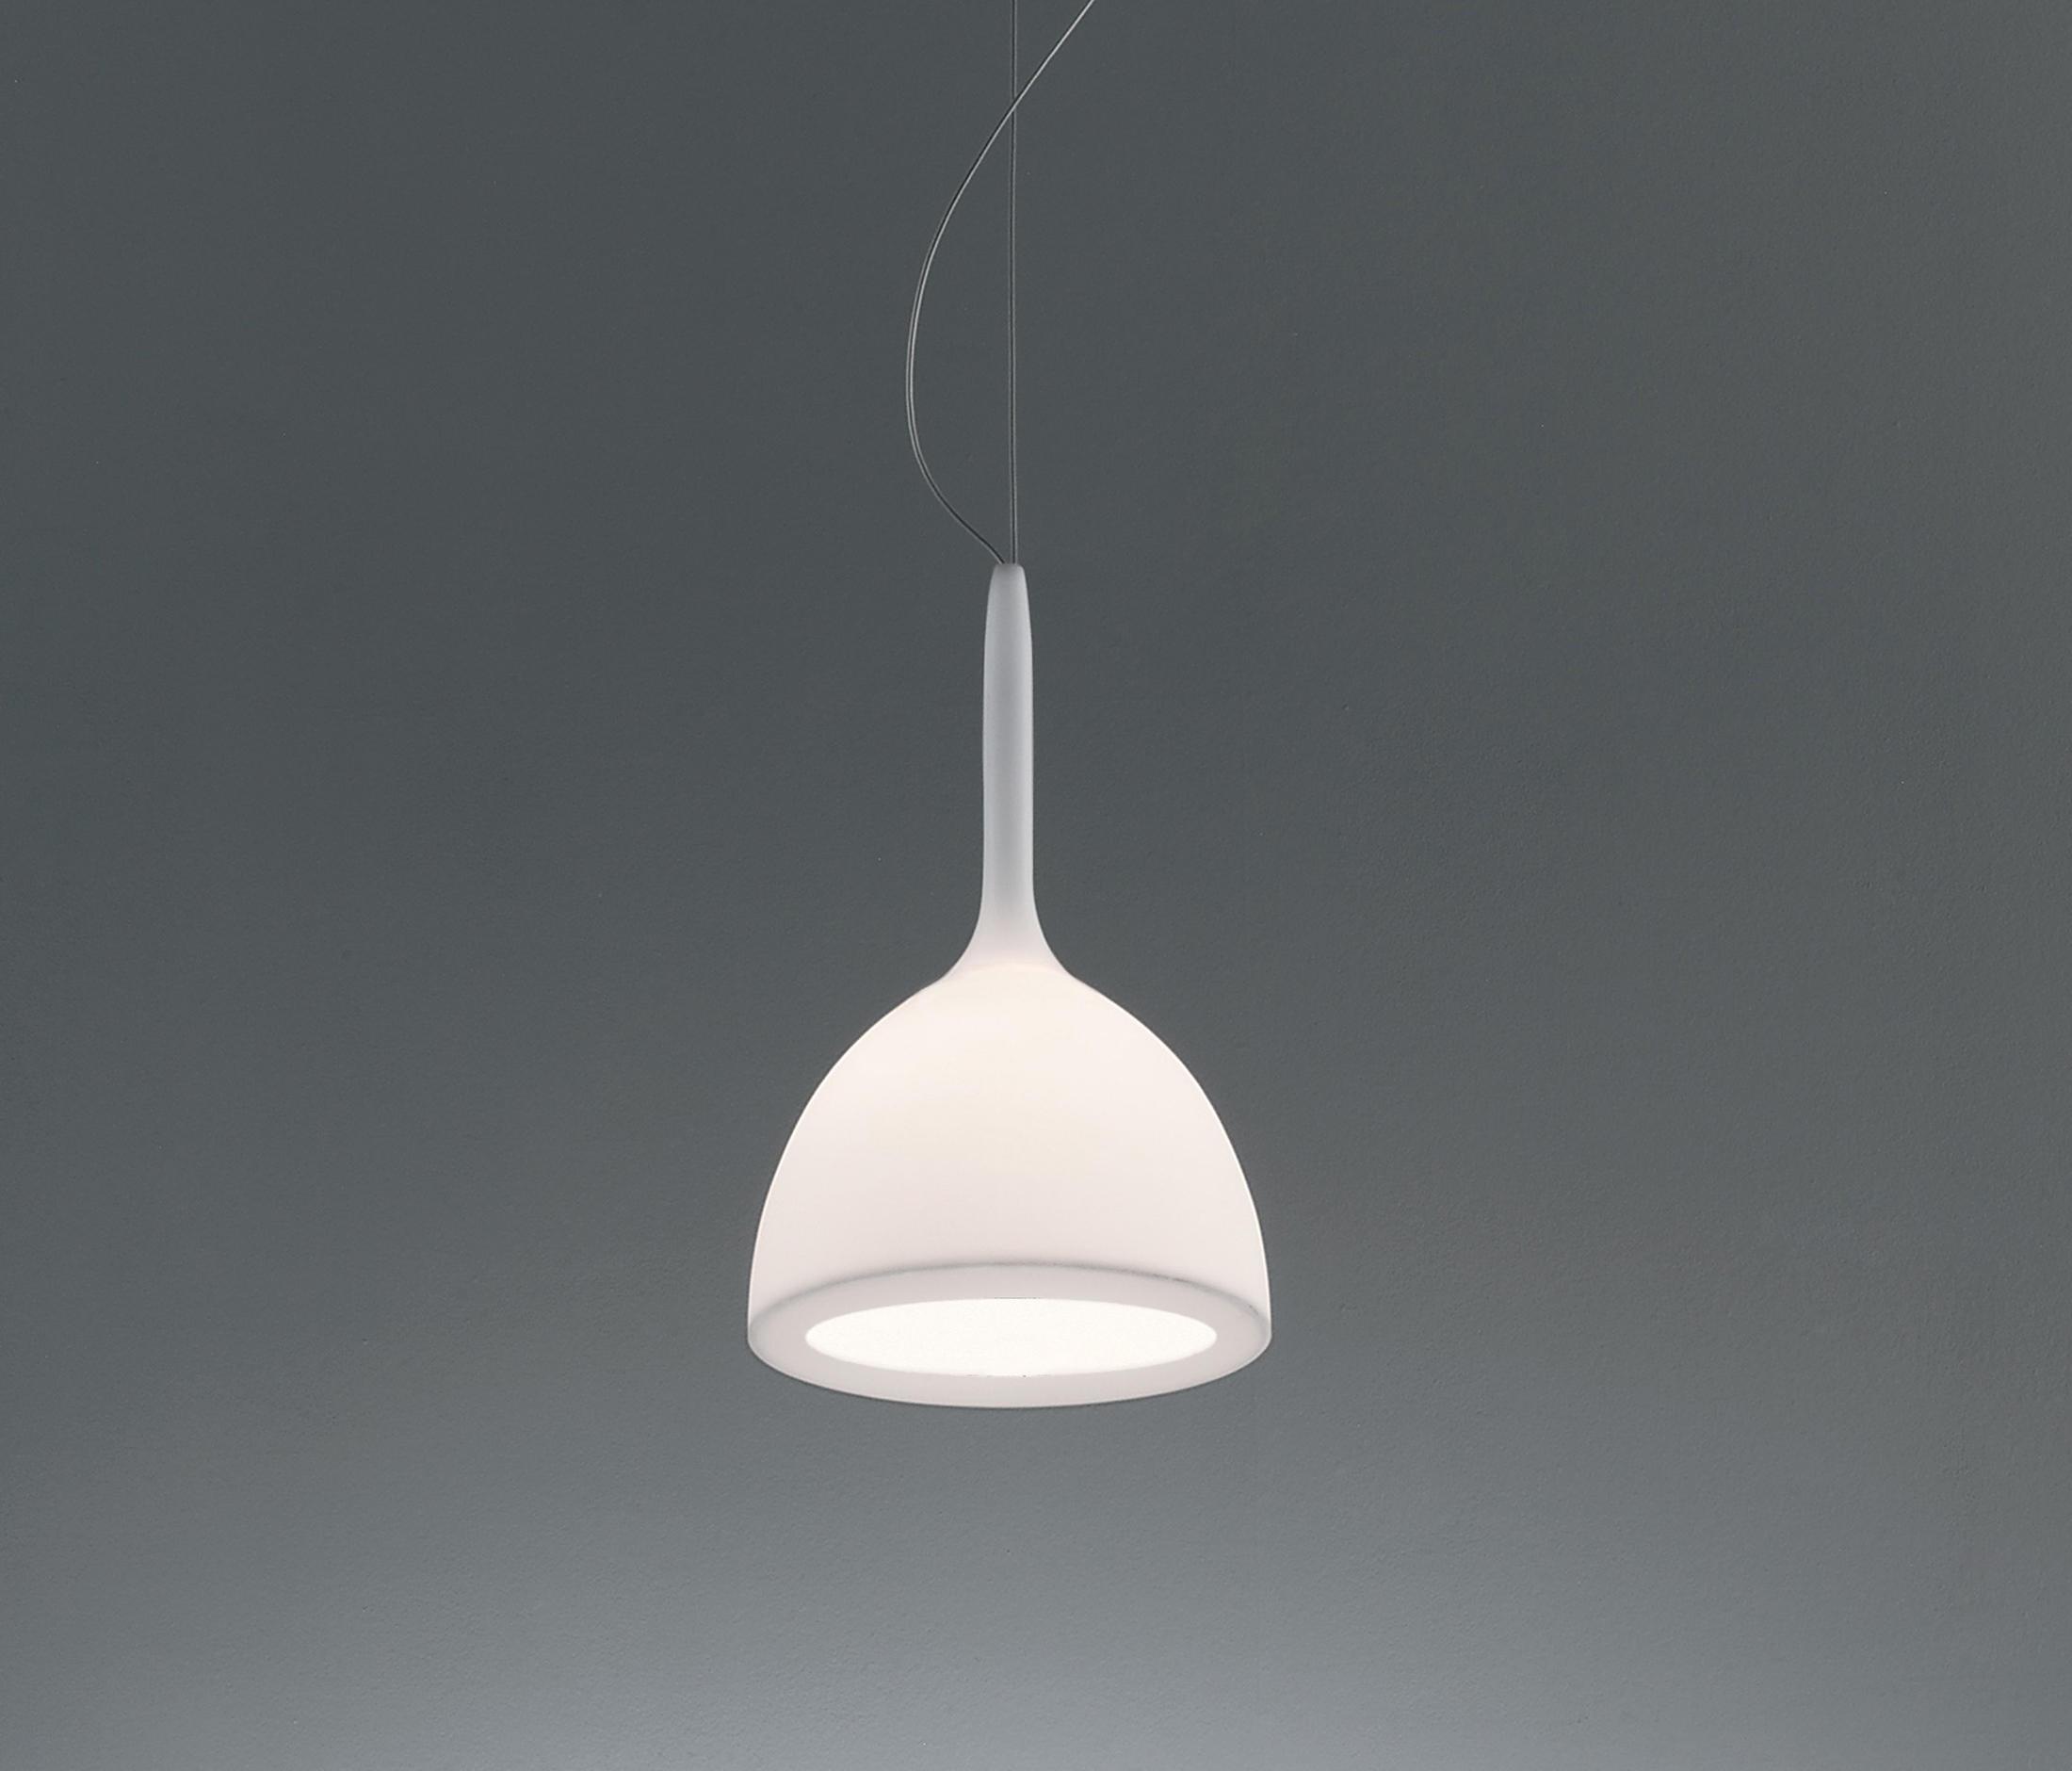 castore calice 18 pendelleuchte allgemeinbeleuchtung von. Black Bedroom Furniture Sets. Home Design Ideas